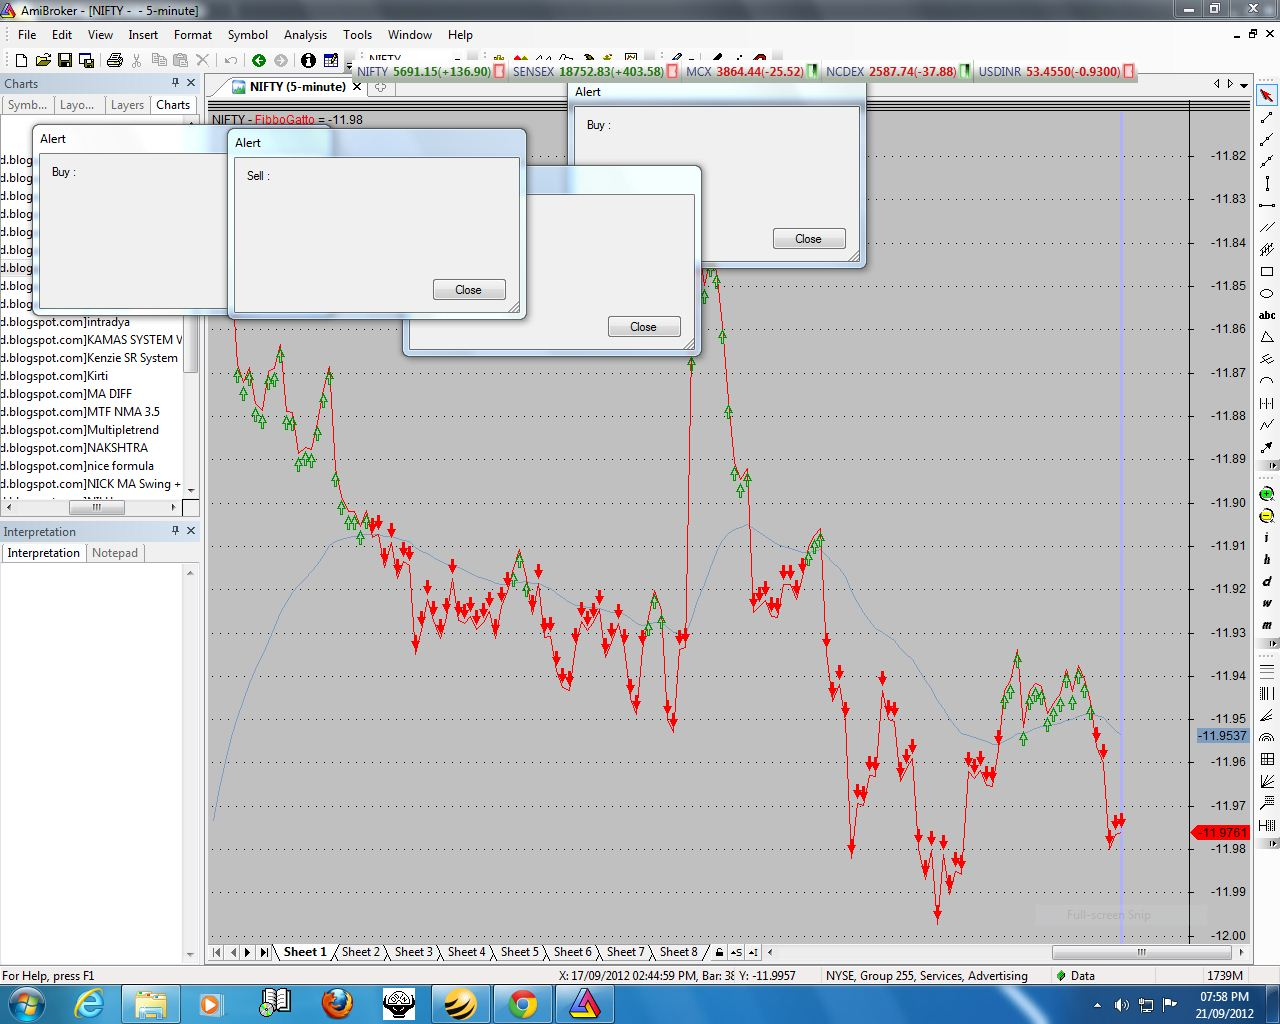 Bhs trading system afl